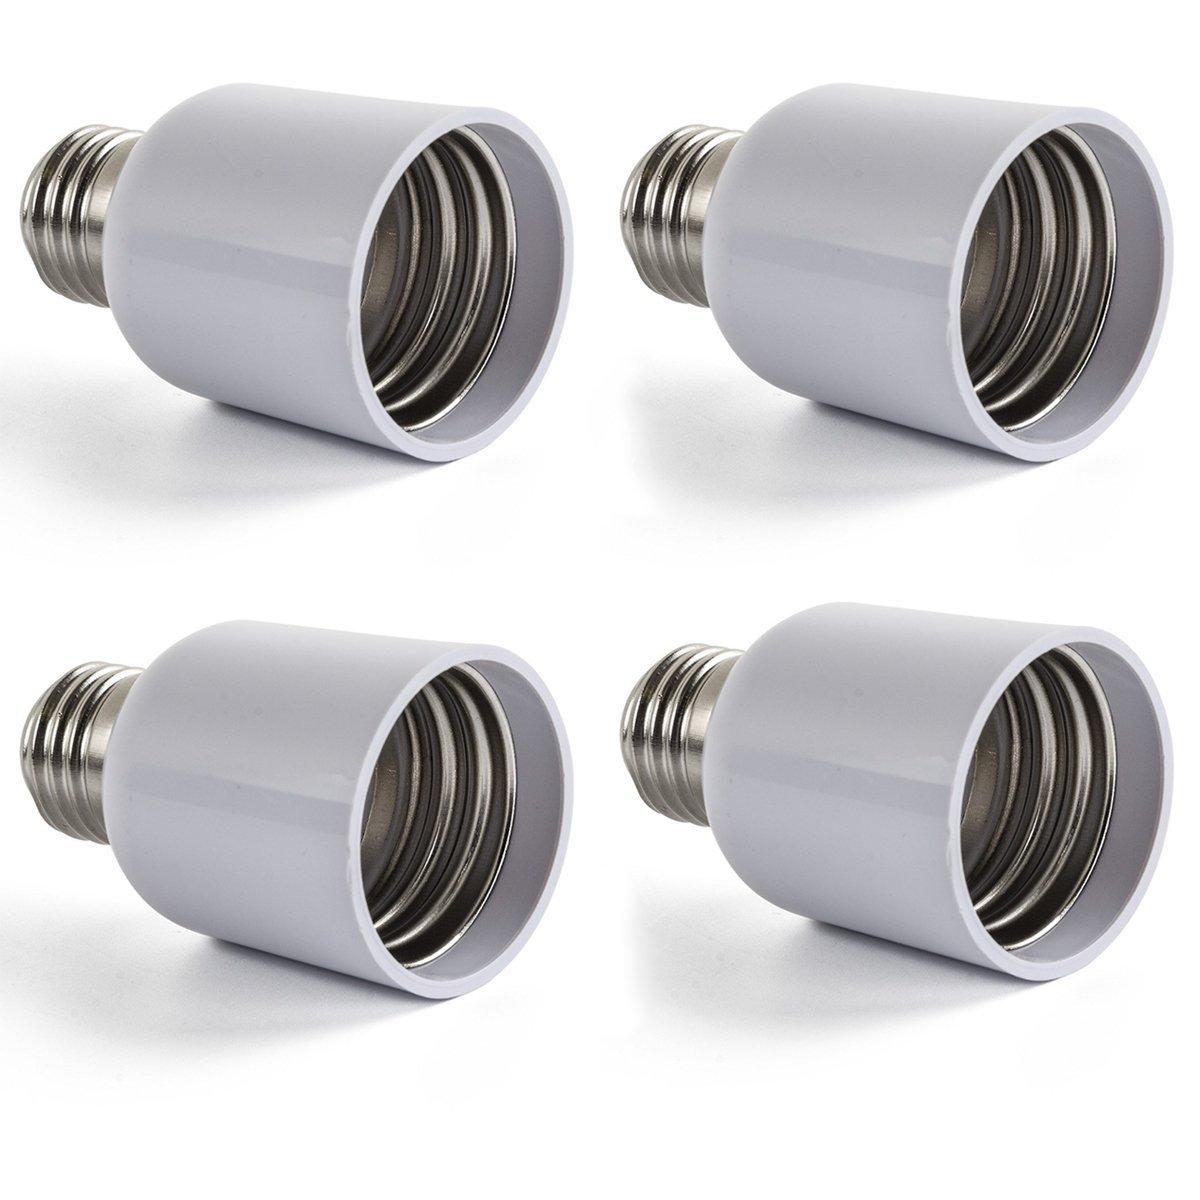 AWE-LIGHT 4X E27 à E40 Adaptateur Convertisseur, Ampoule LED Base Douille E27 vers E40 - Normes CE RoHS E40-E27